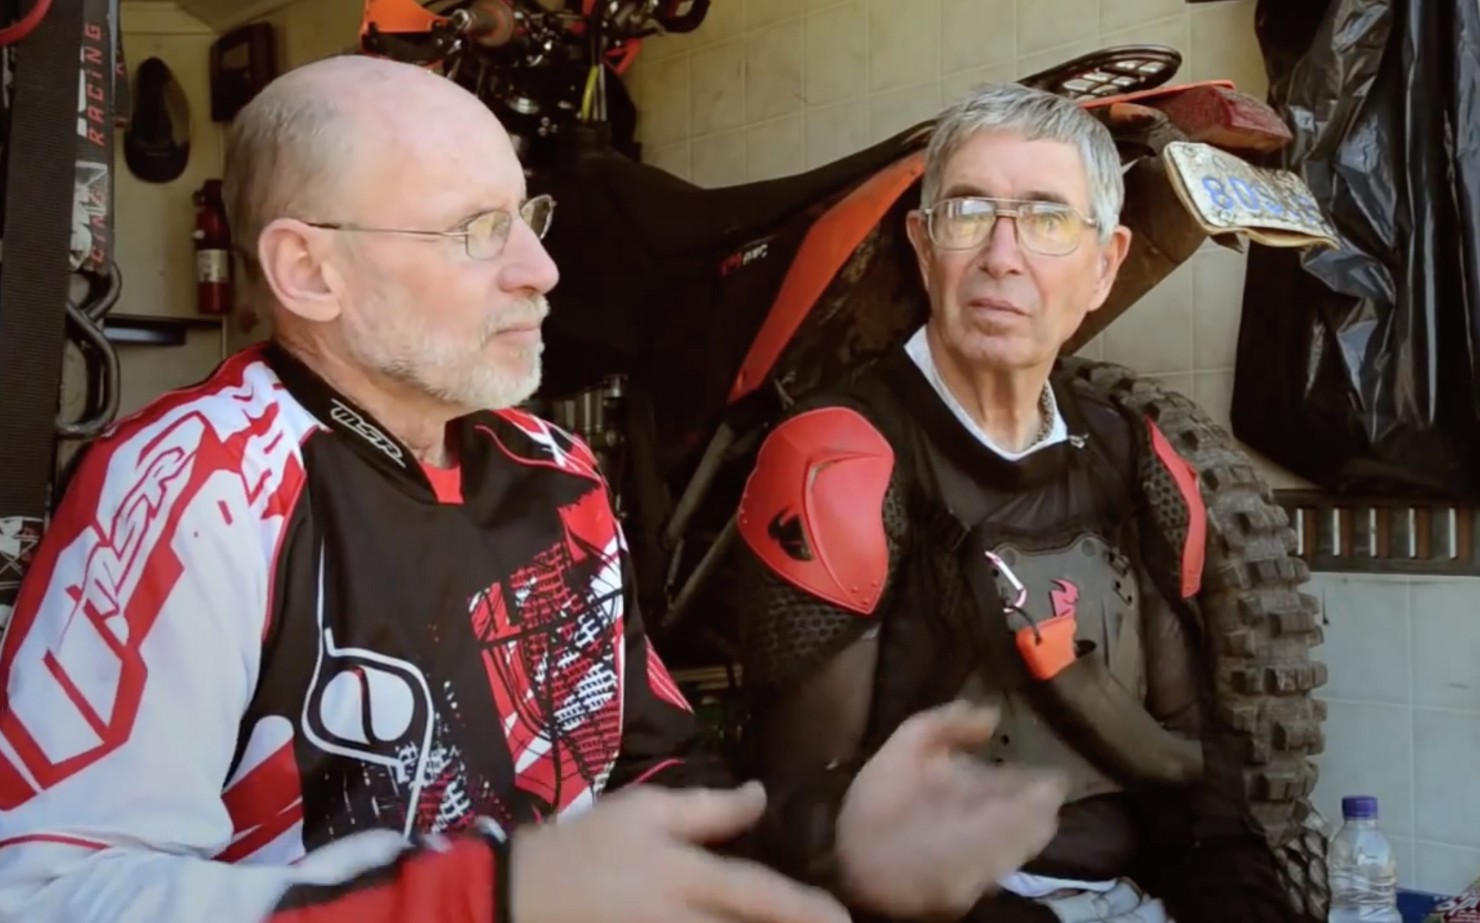 Fifty Years of Kicks - Motorcycle Documentary 2